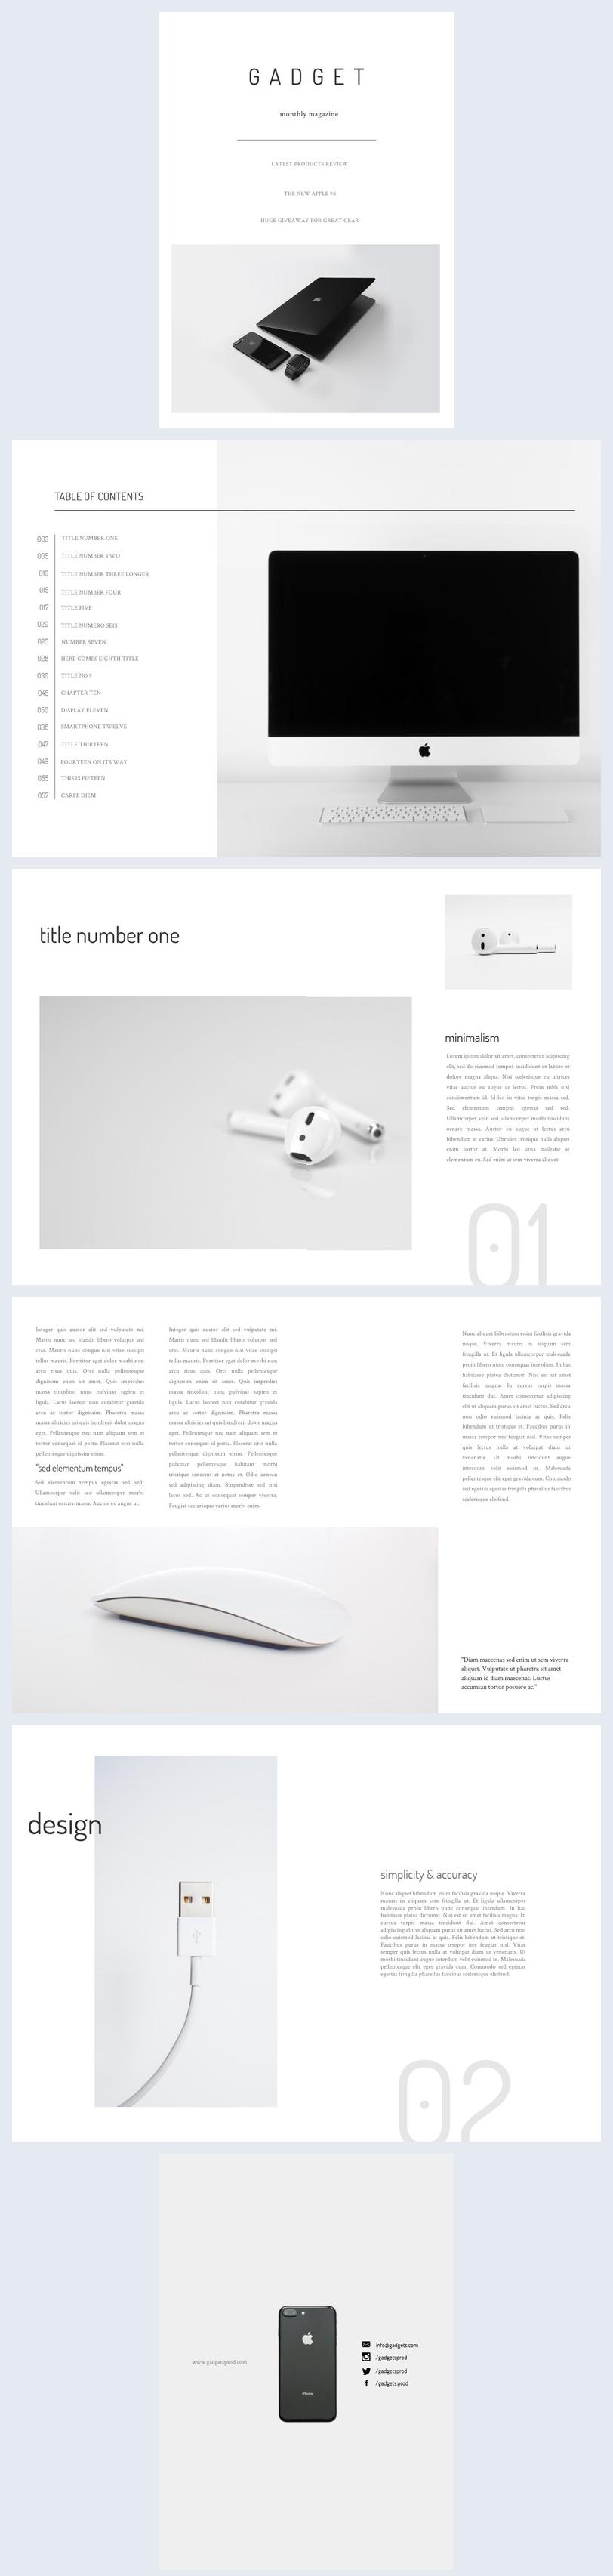 Gadgets Minimalistisch Tijdschrift Sjabloon